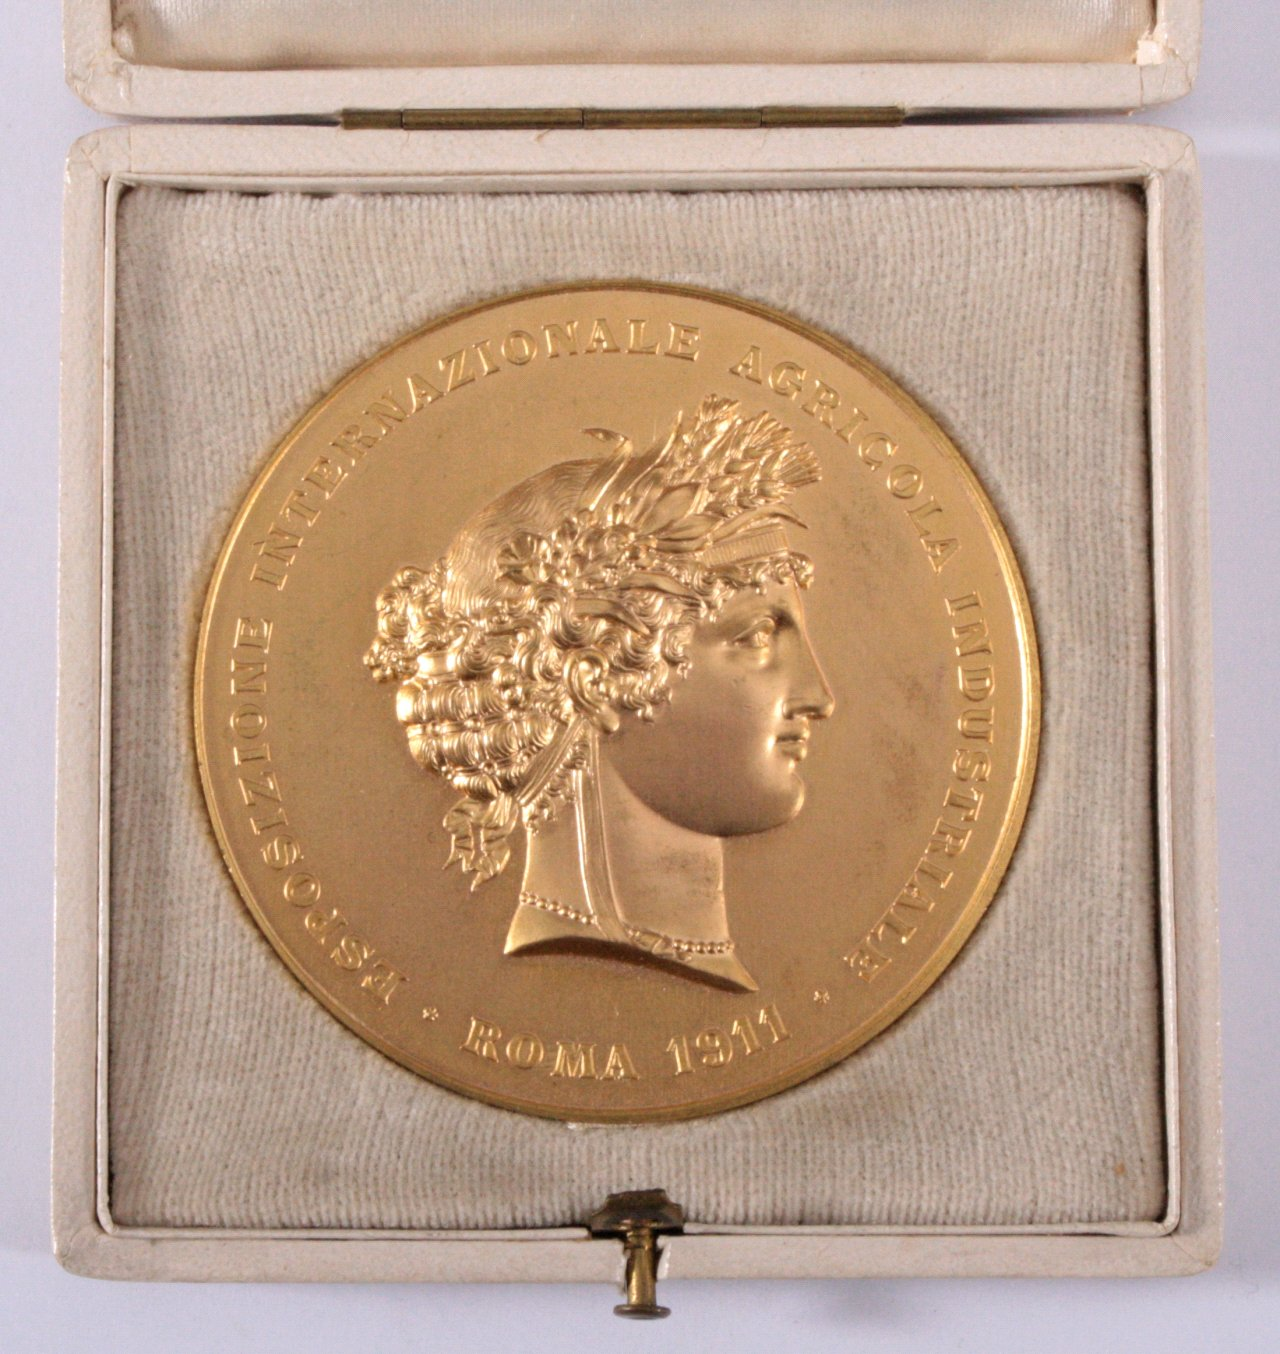 Bronze-Medaille, vergoldet, Esposizione Internazionale 1911